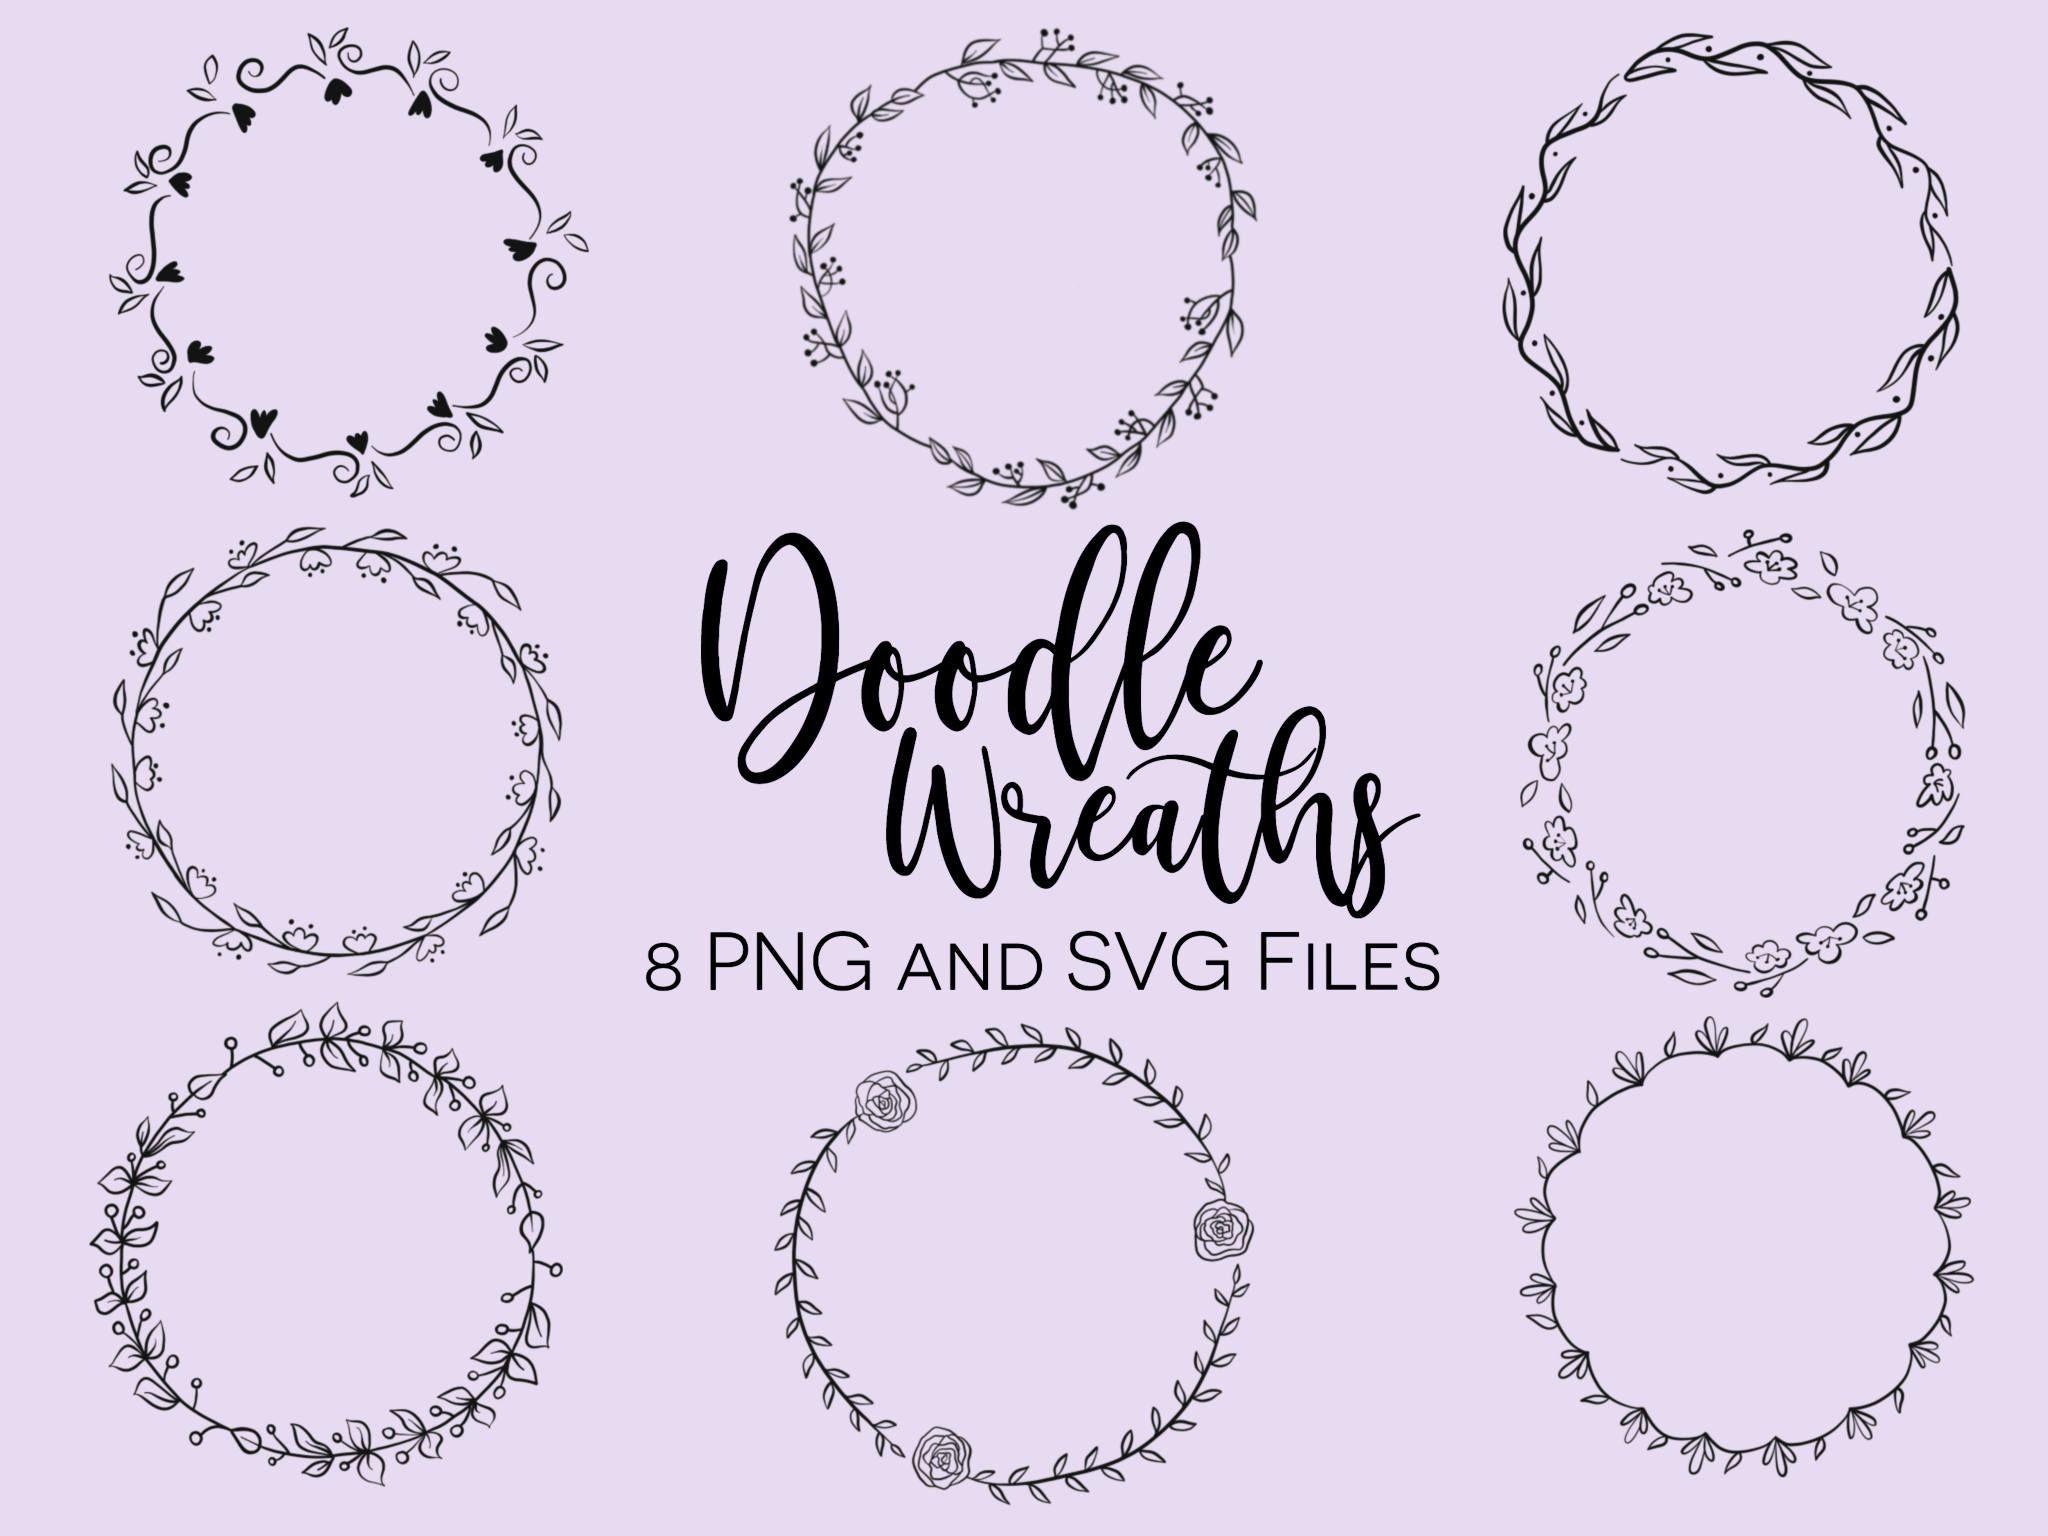 Photo of FLORAL WREATHS, hand-drawn wreaths, doodle clipart, floral wreaths, rustic, drawn wreaths, png, svg, vector wreaths, wedding, minimal